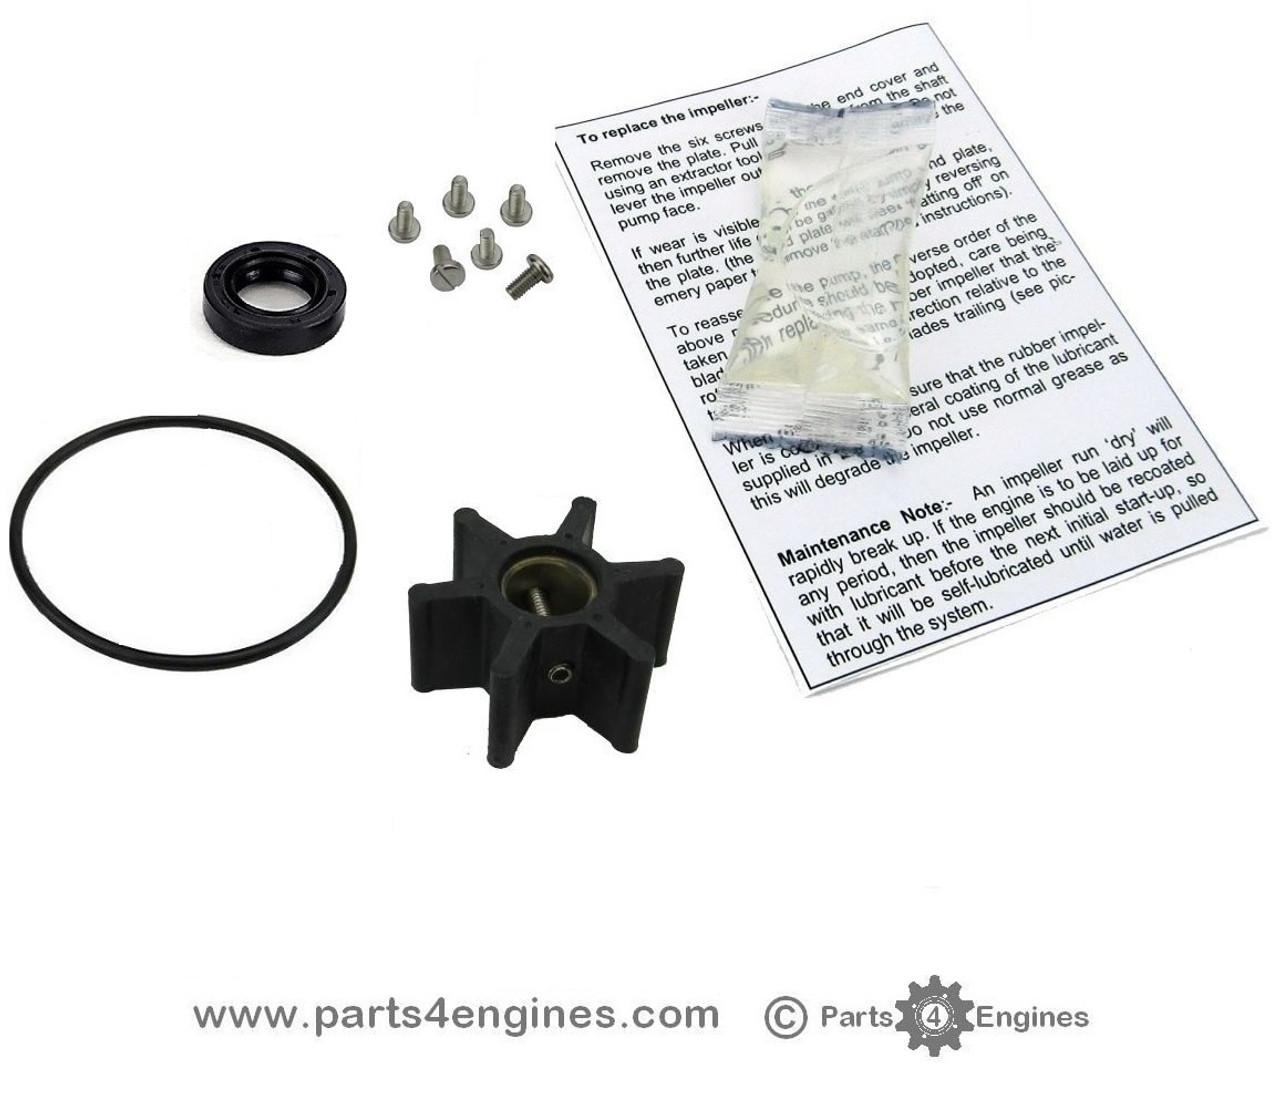 Yanmar 3YM30 Raw water pump service kit - parts4engines.com